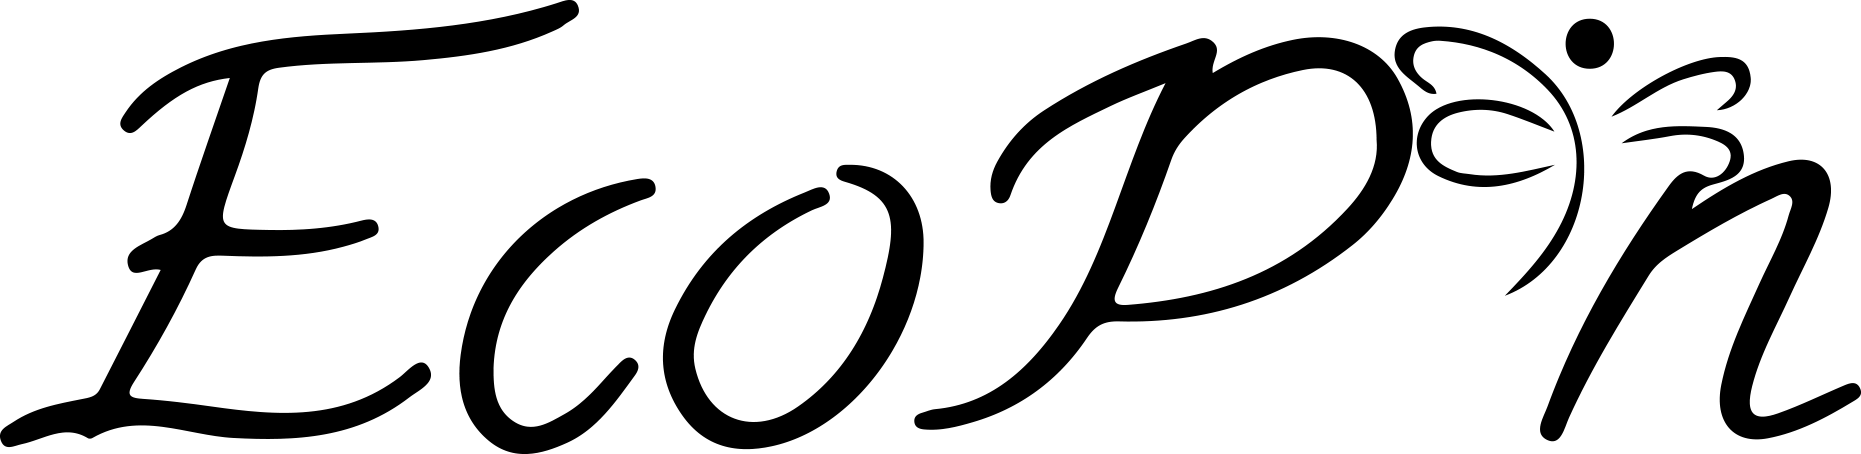 Ecopin Logo